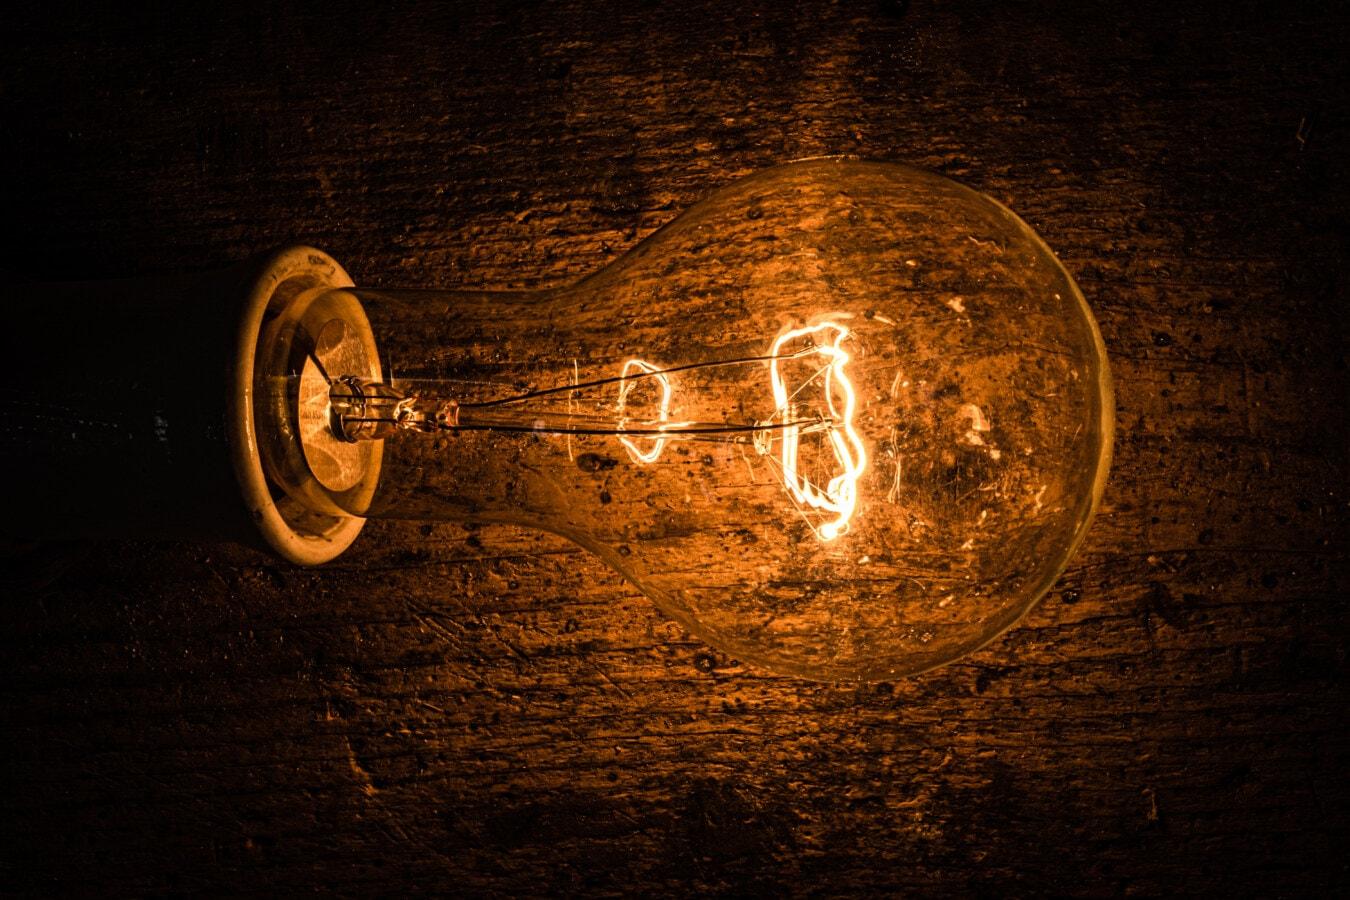 light bulb, darkness, old style, vintage, electricity, voltage, filament, bulb, dark, light